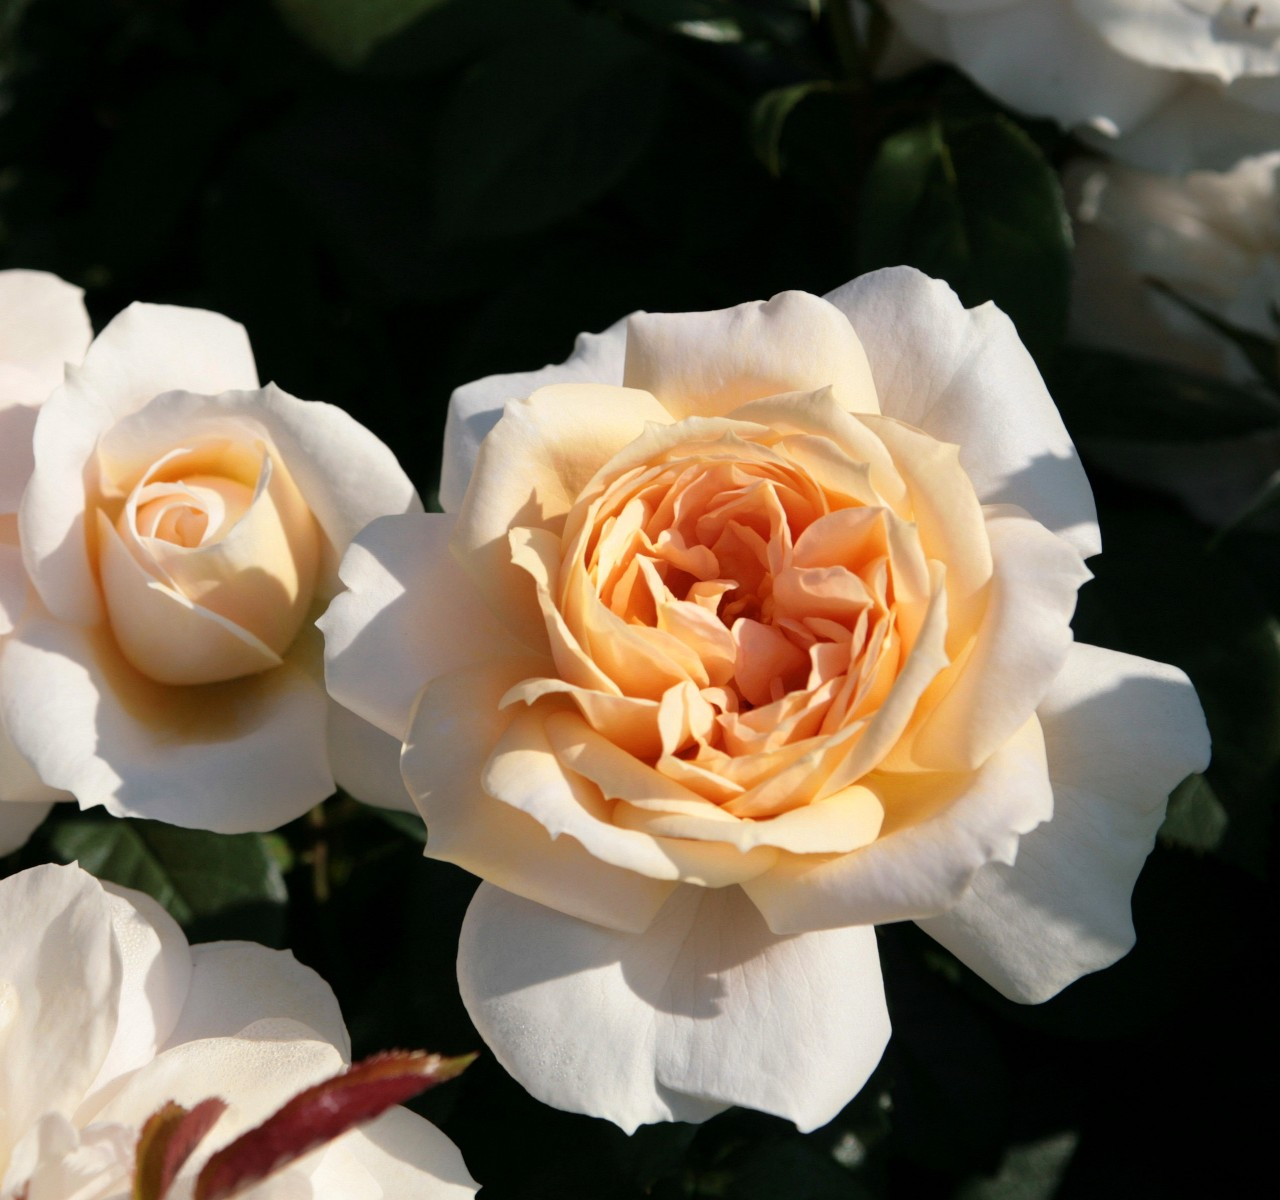 la collection globe planter rosier roses feeriques. Black Bedroom Furniture Sets. Home Design Ideas